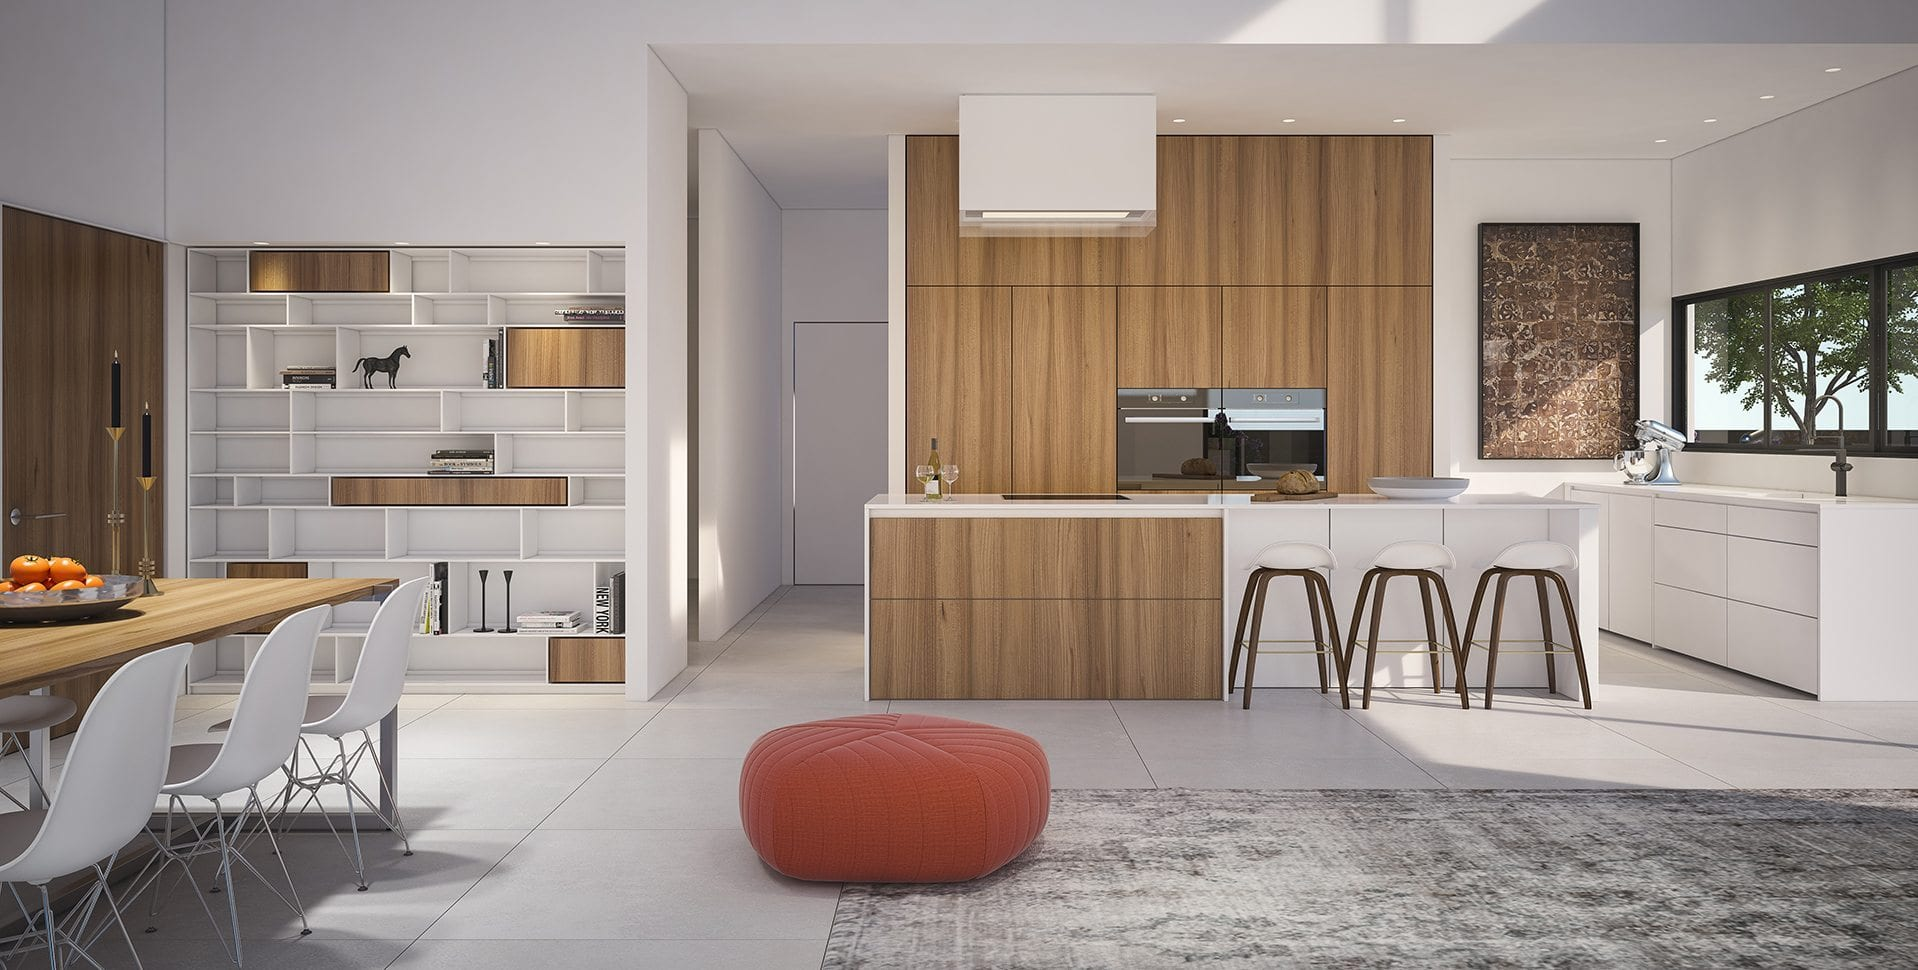 Maayan-Golan_Architectural-Visualization_house-interior-visualization_kitchen-dining_hardof-el-yam_ Rosh-Pina_02